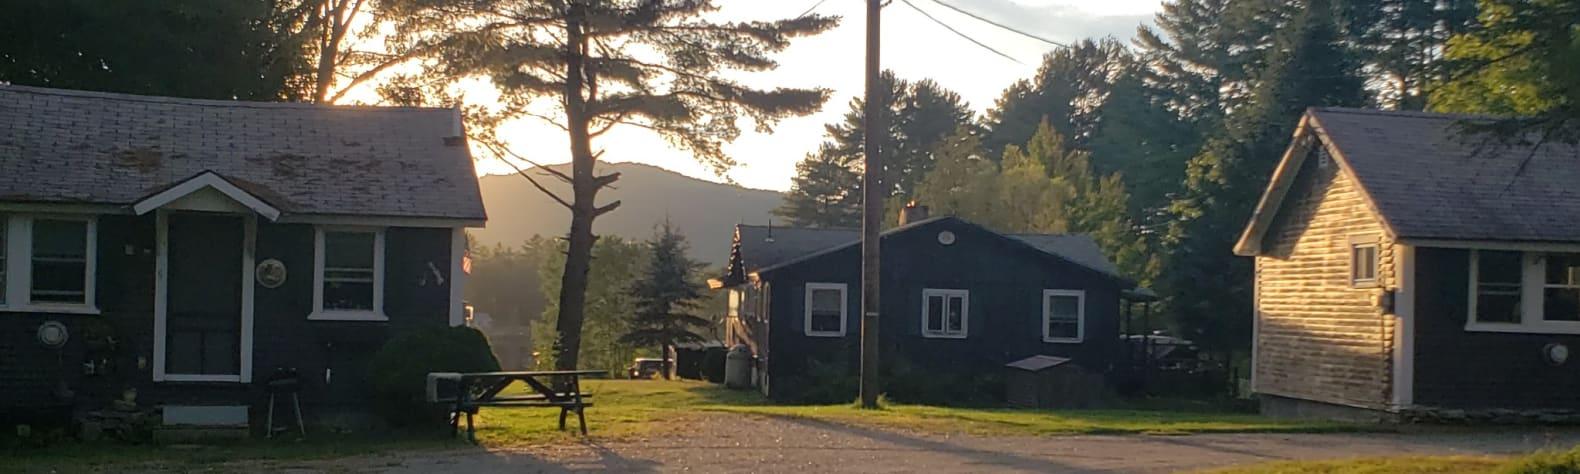 Magic cottages on Mirror Lake